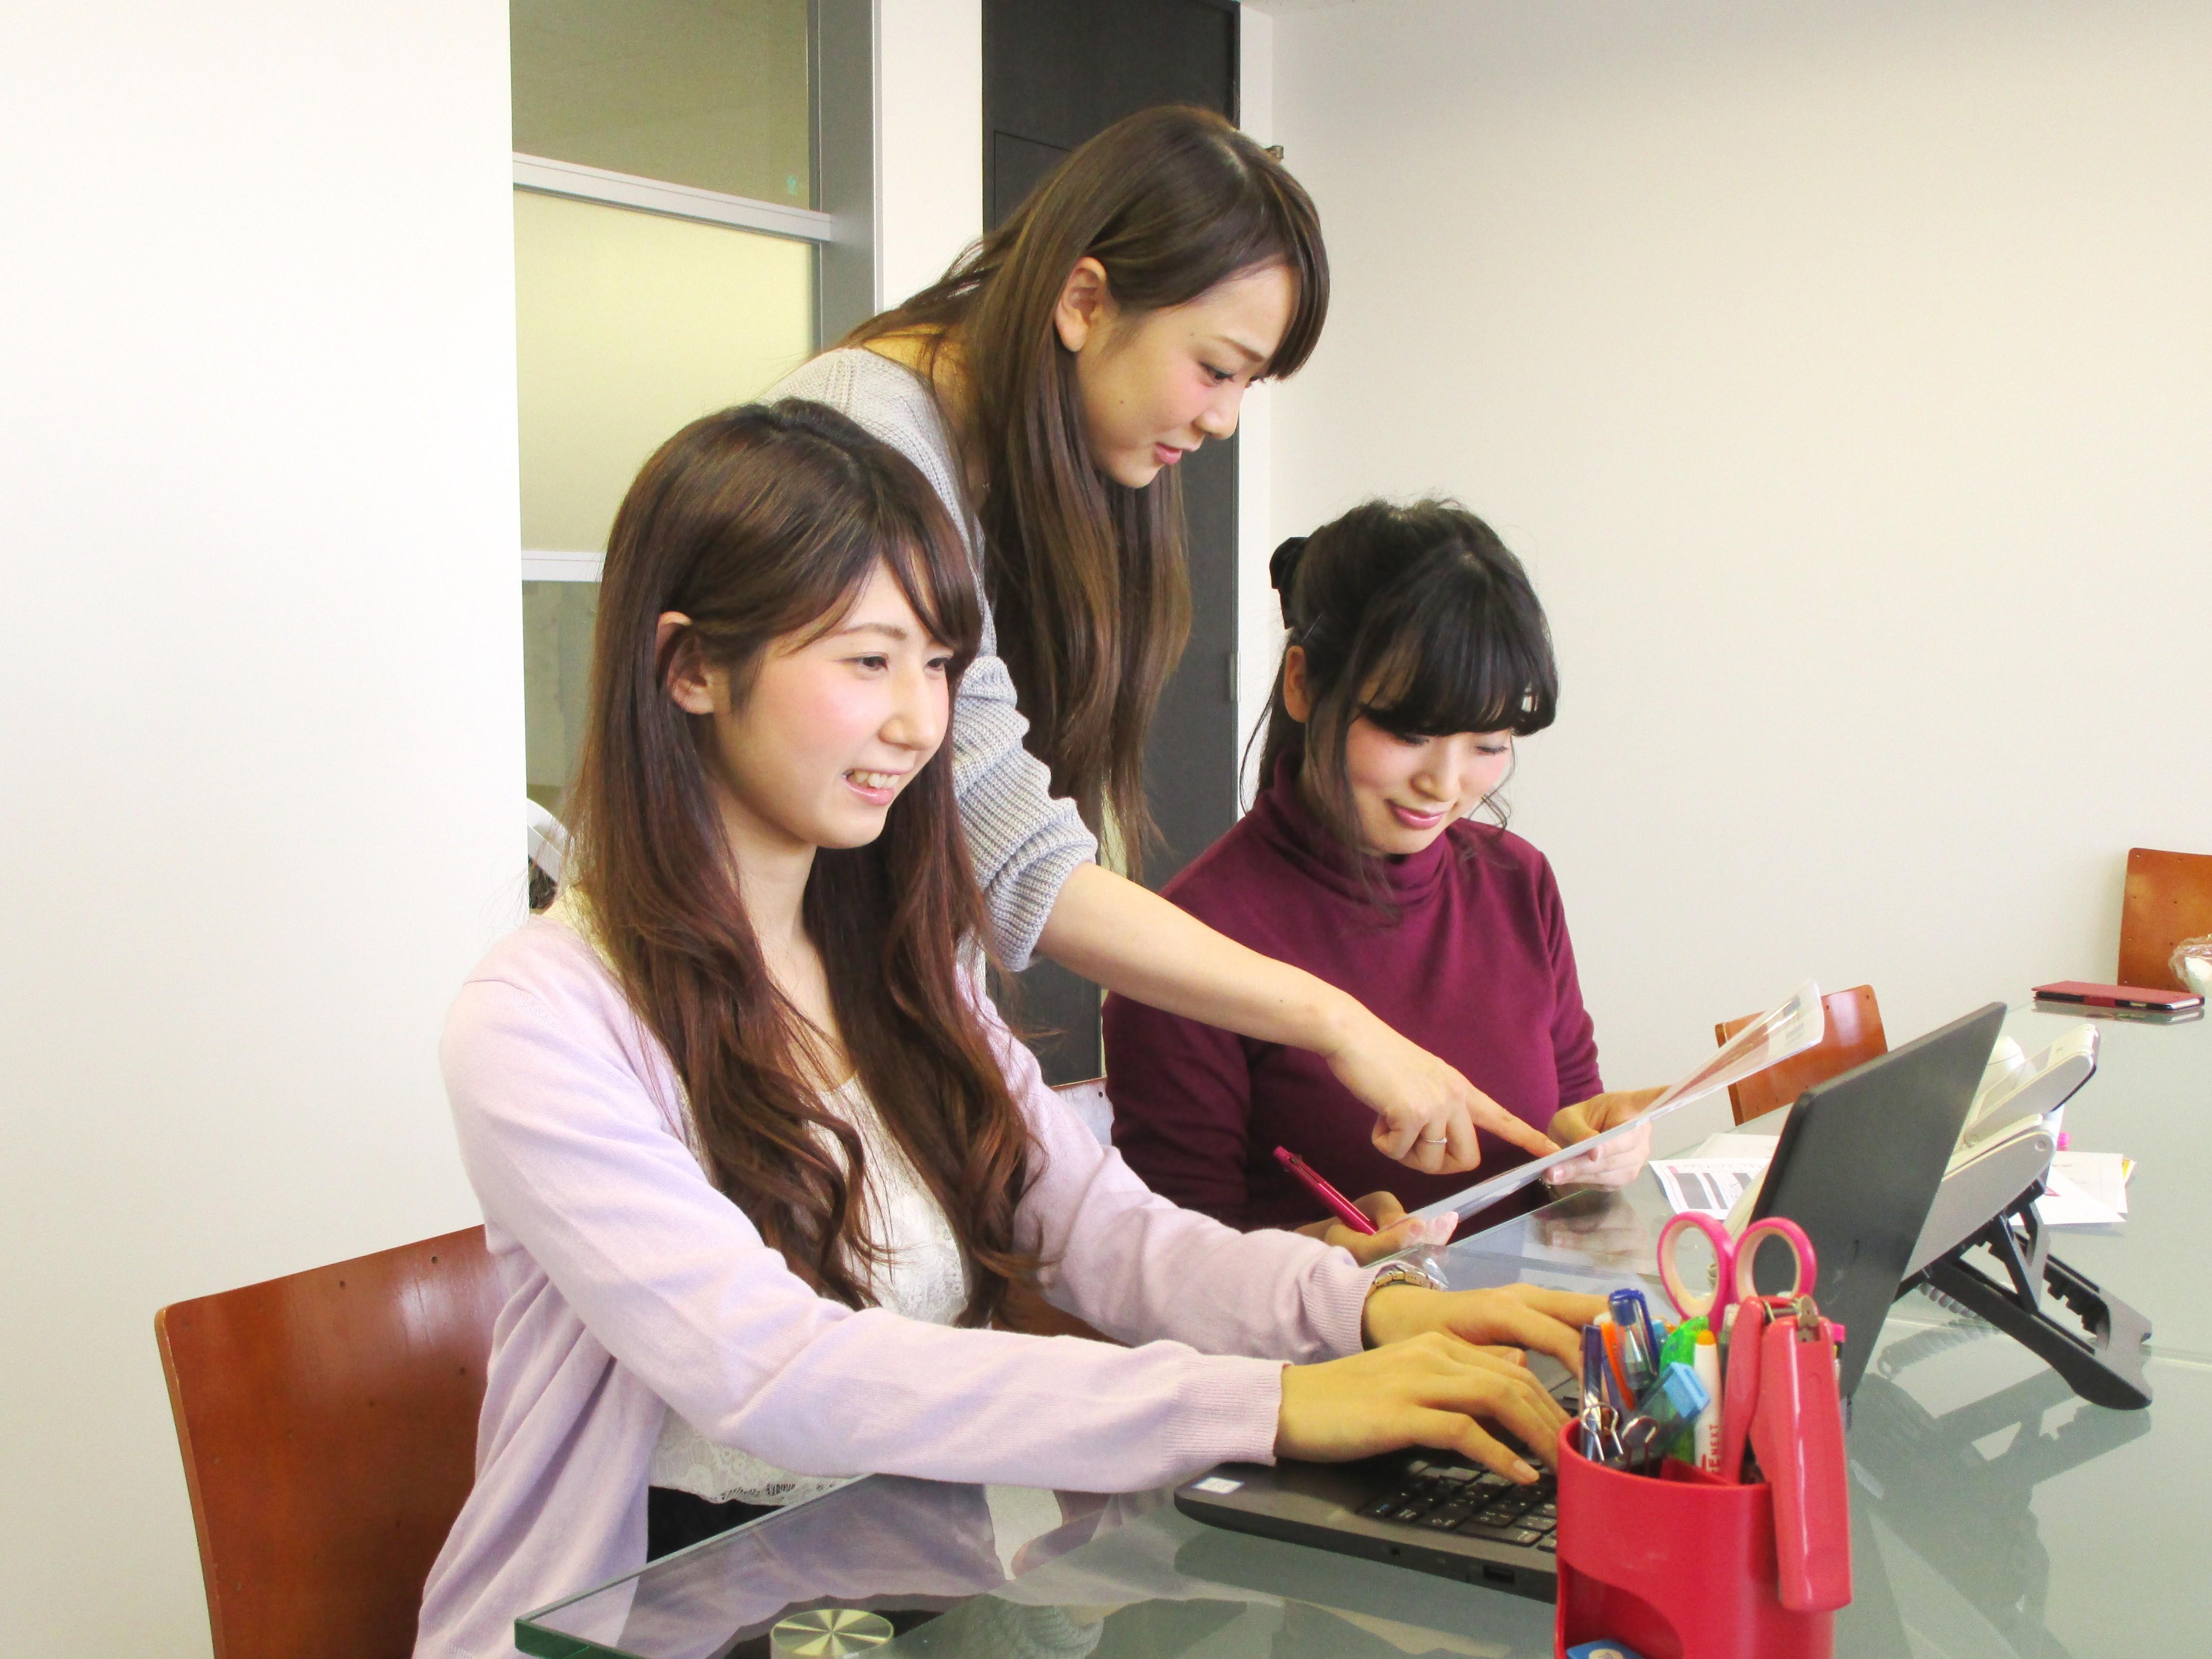 PIA津田沼店 事務スタッフ のアルバイト情報